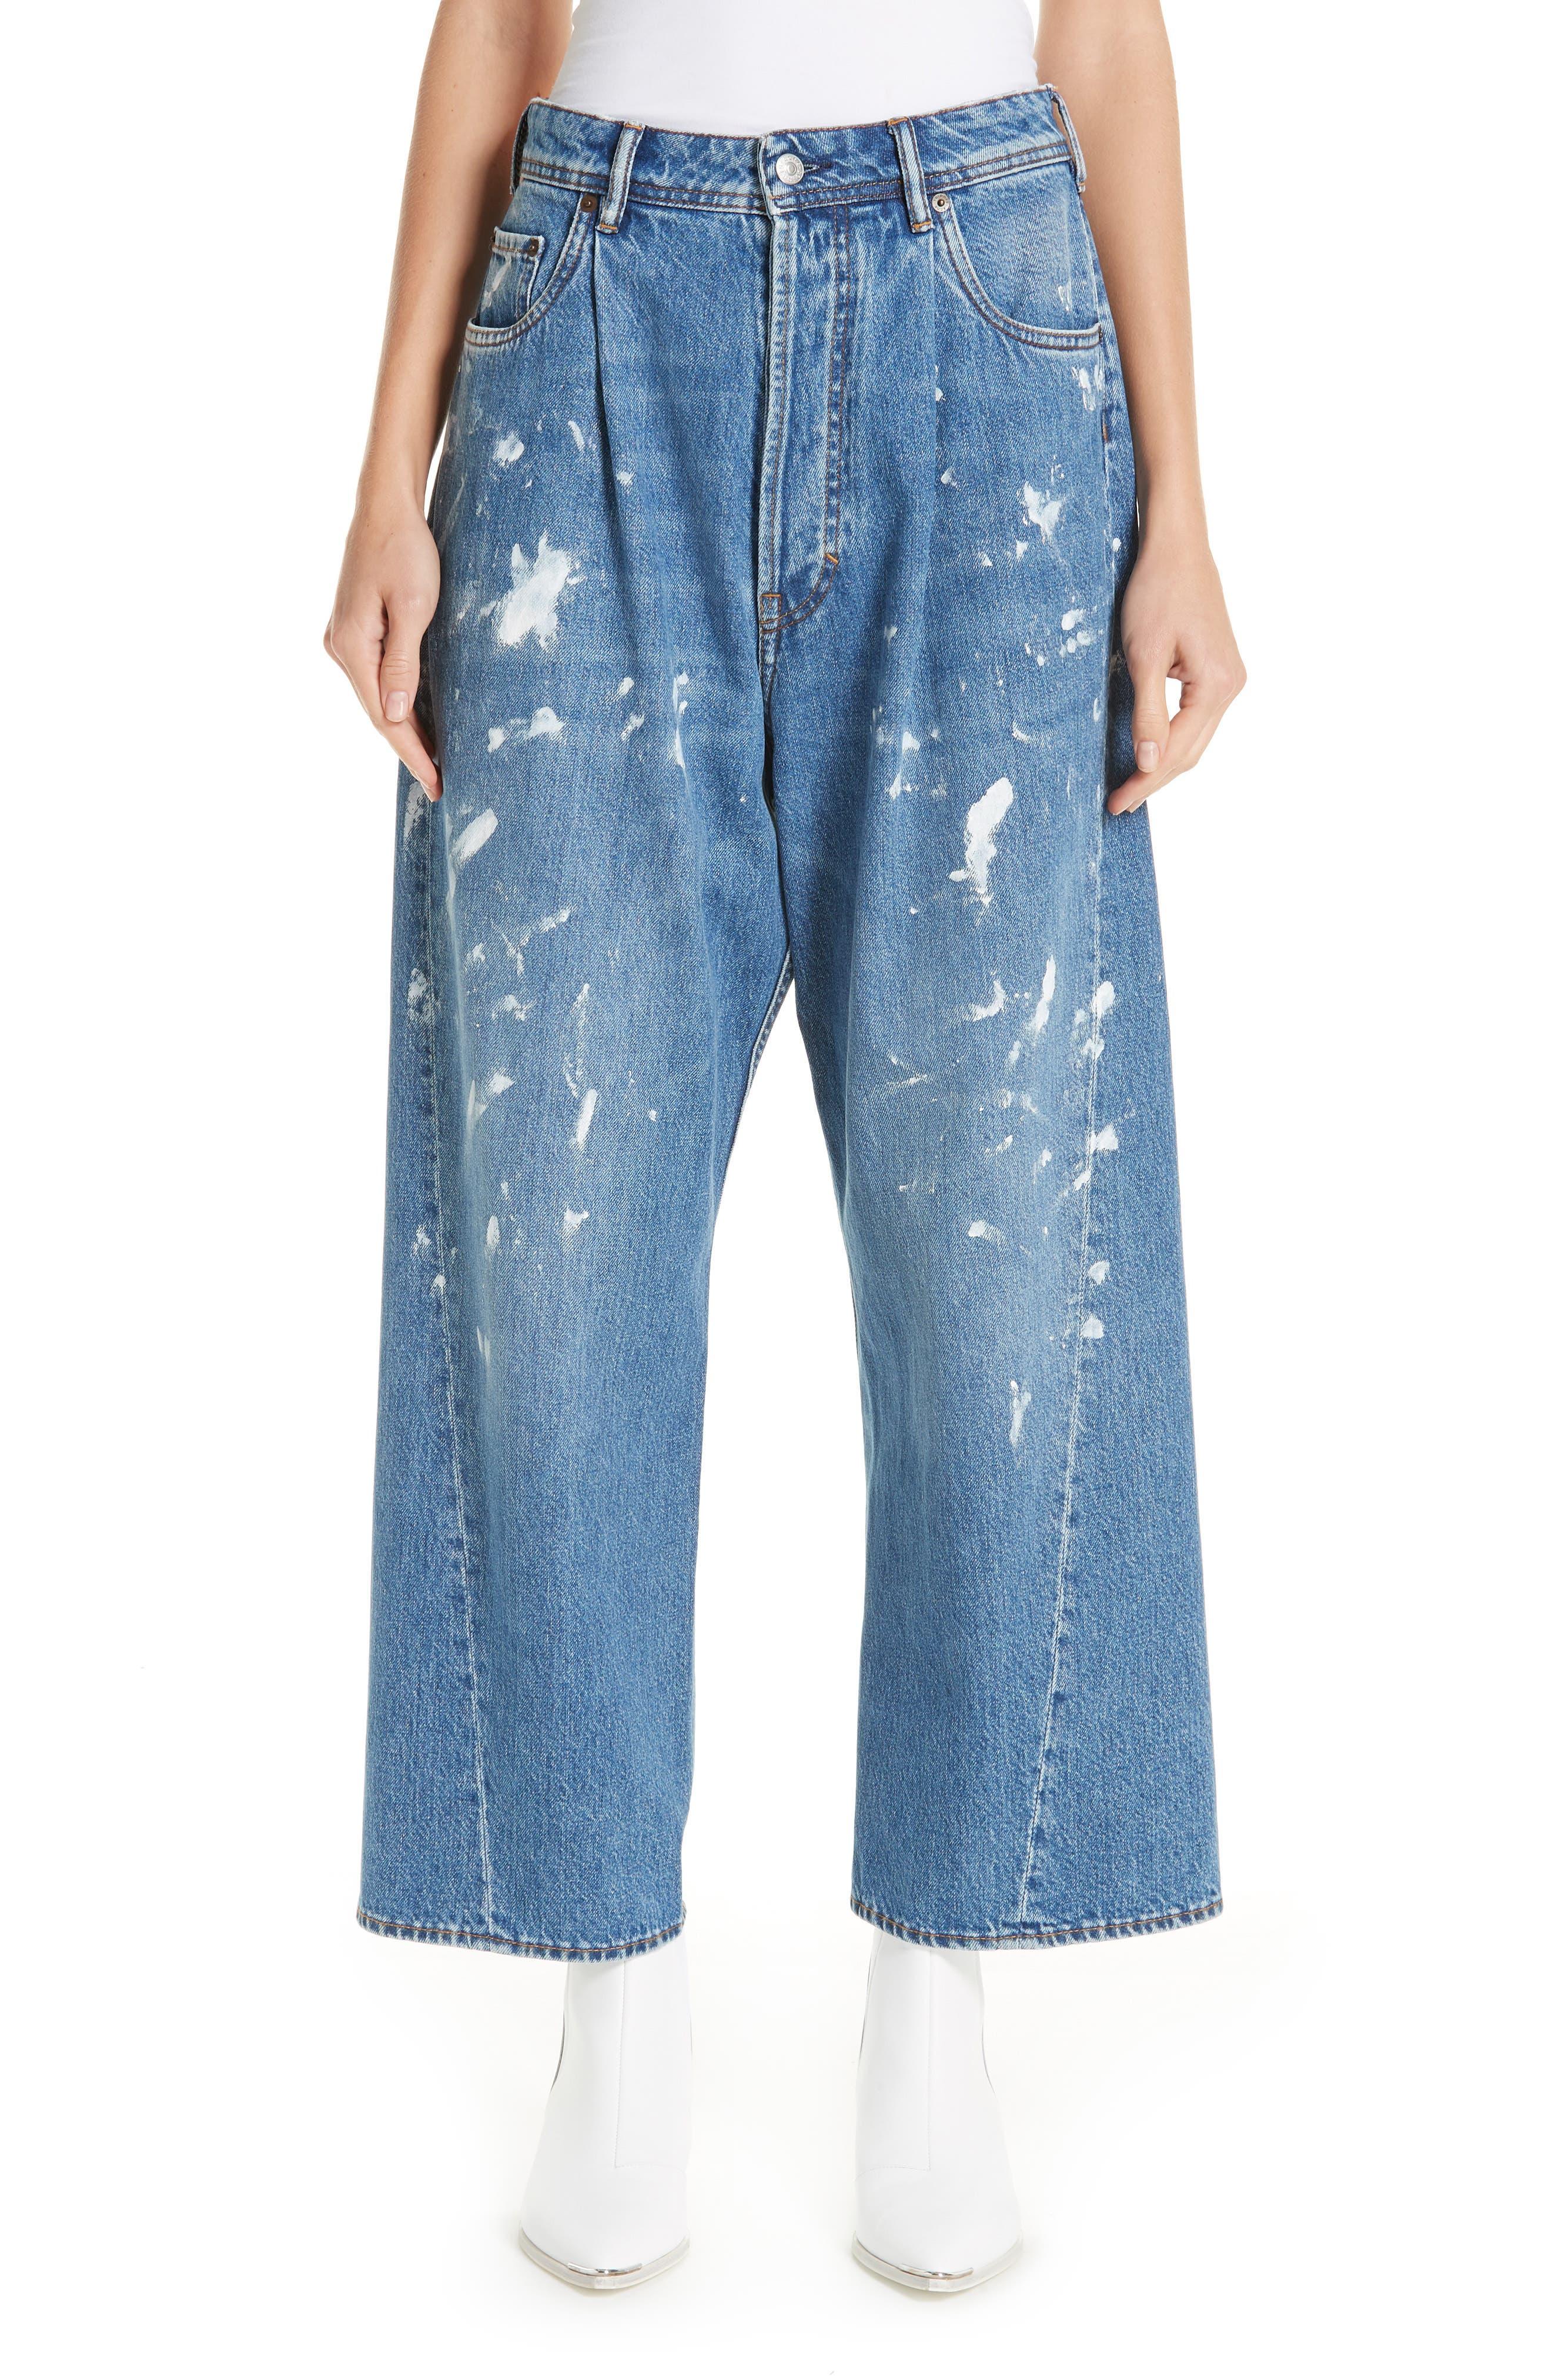 ACNE STUDIOS,                             Oversized Jeans,                             Main thumbnail 1, color,                             400